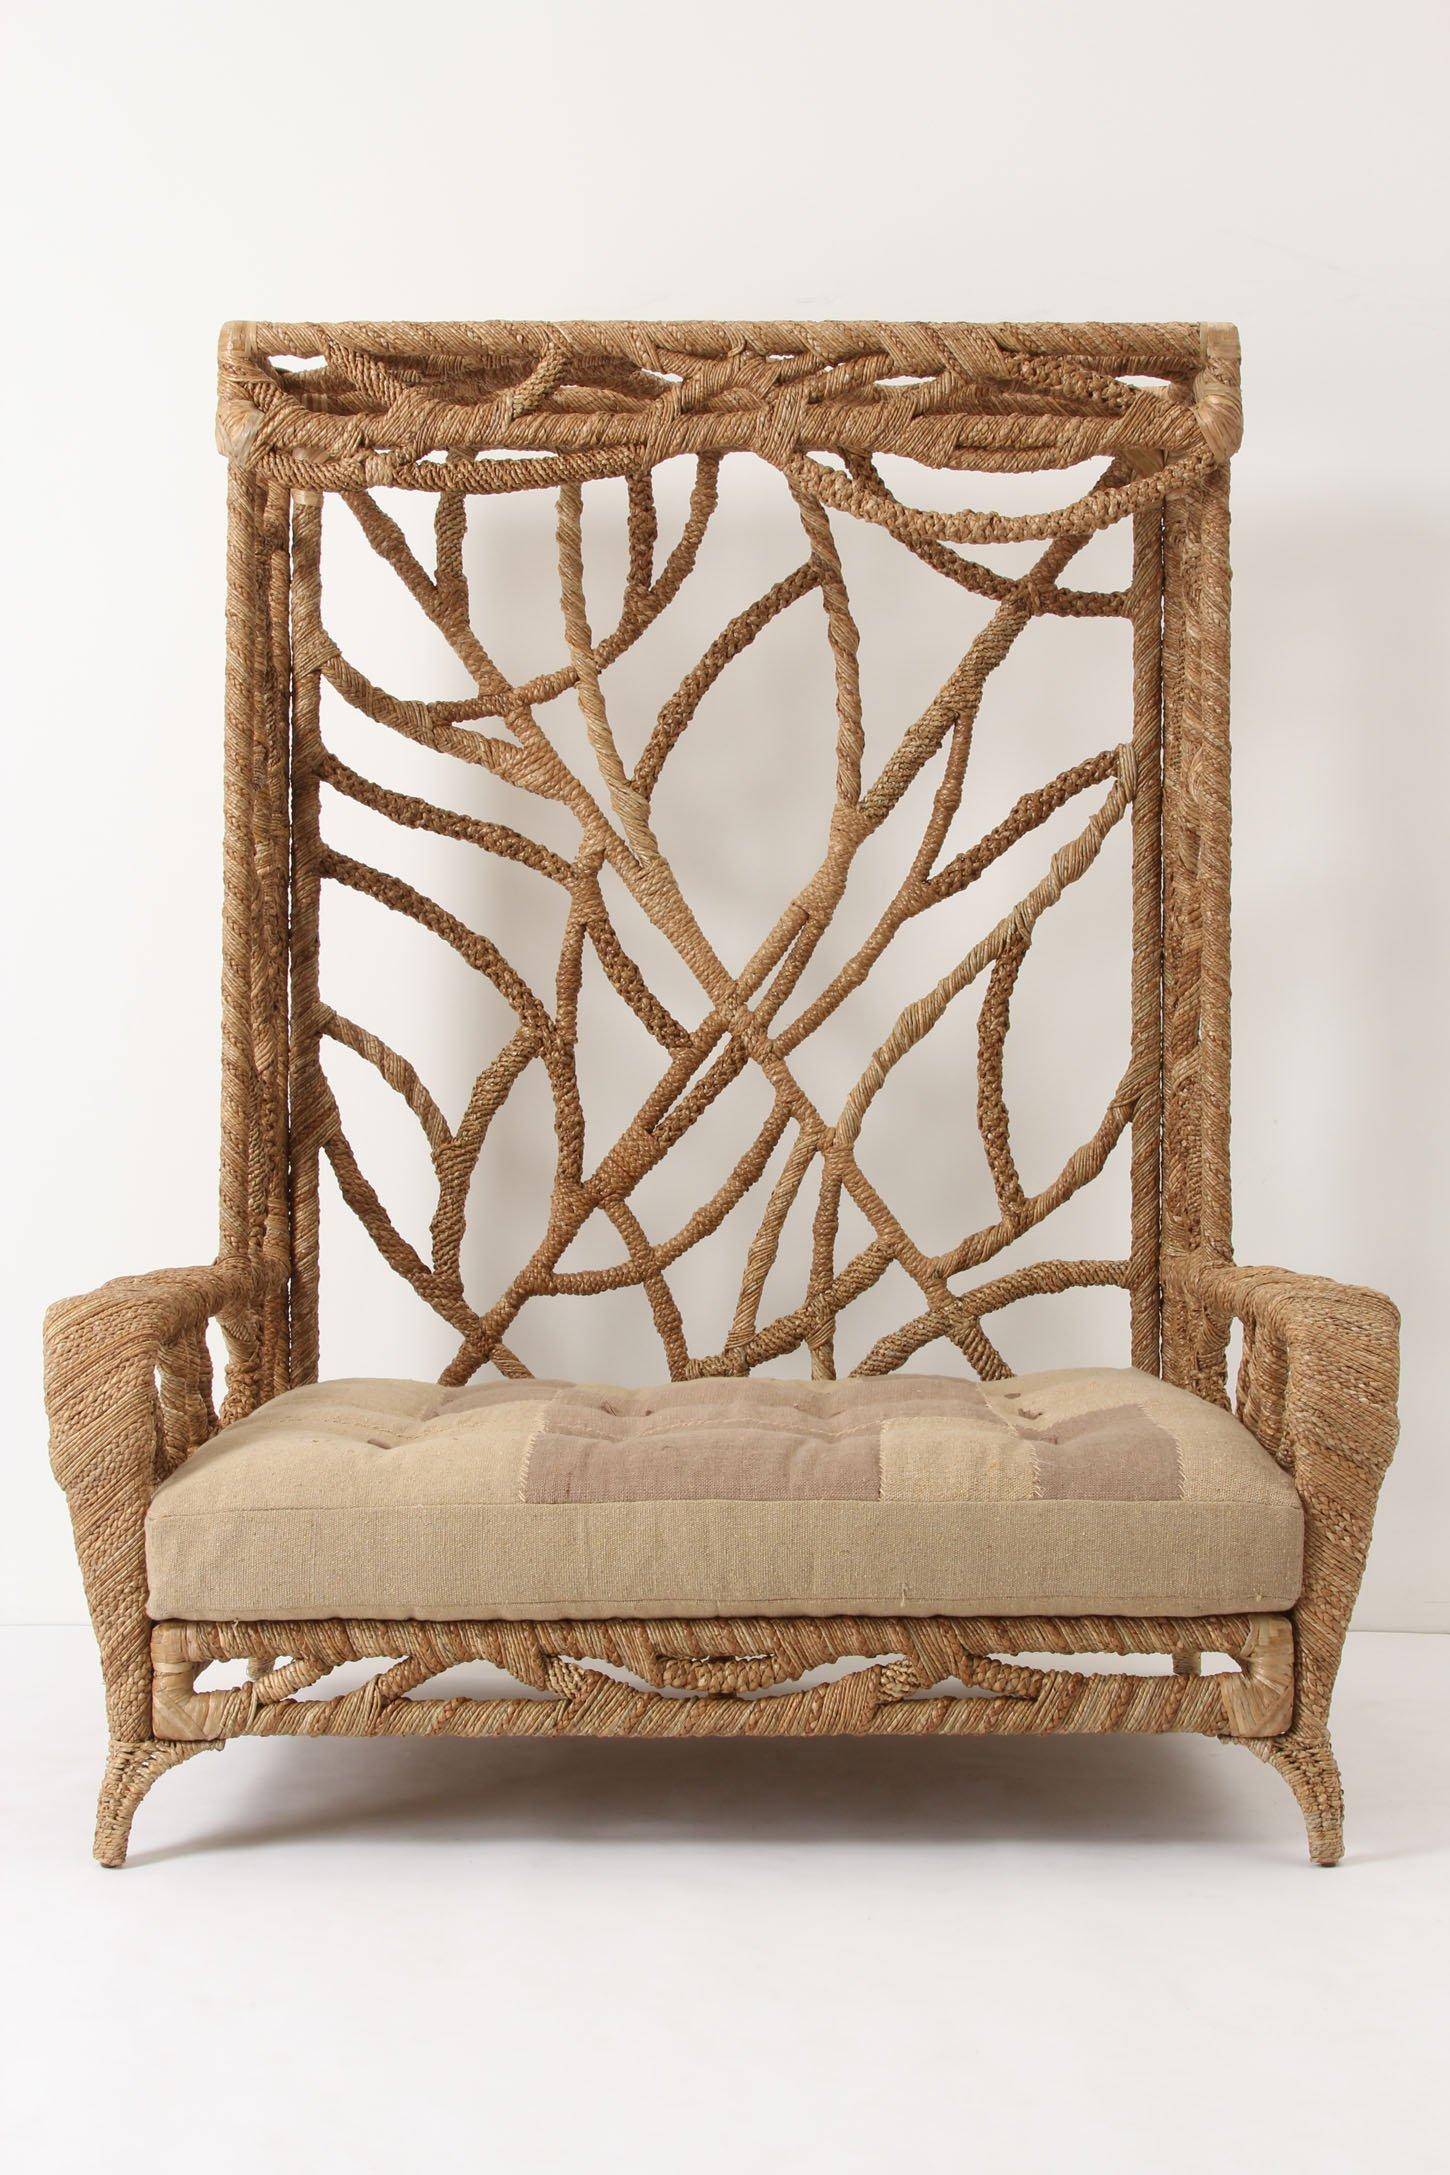 Anthropologie Brings Modern Indoor and Outdoor Furniture